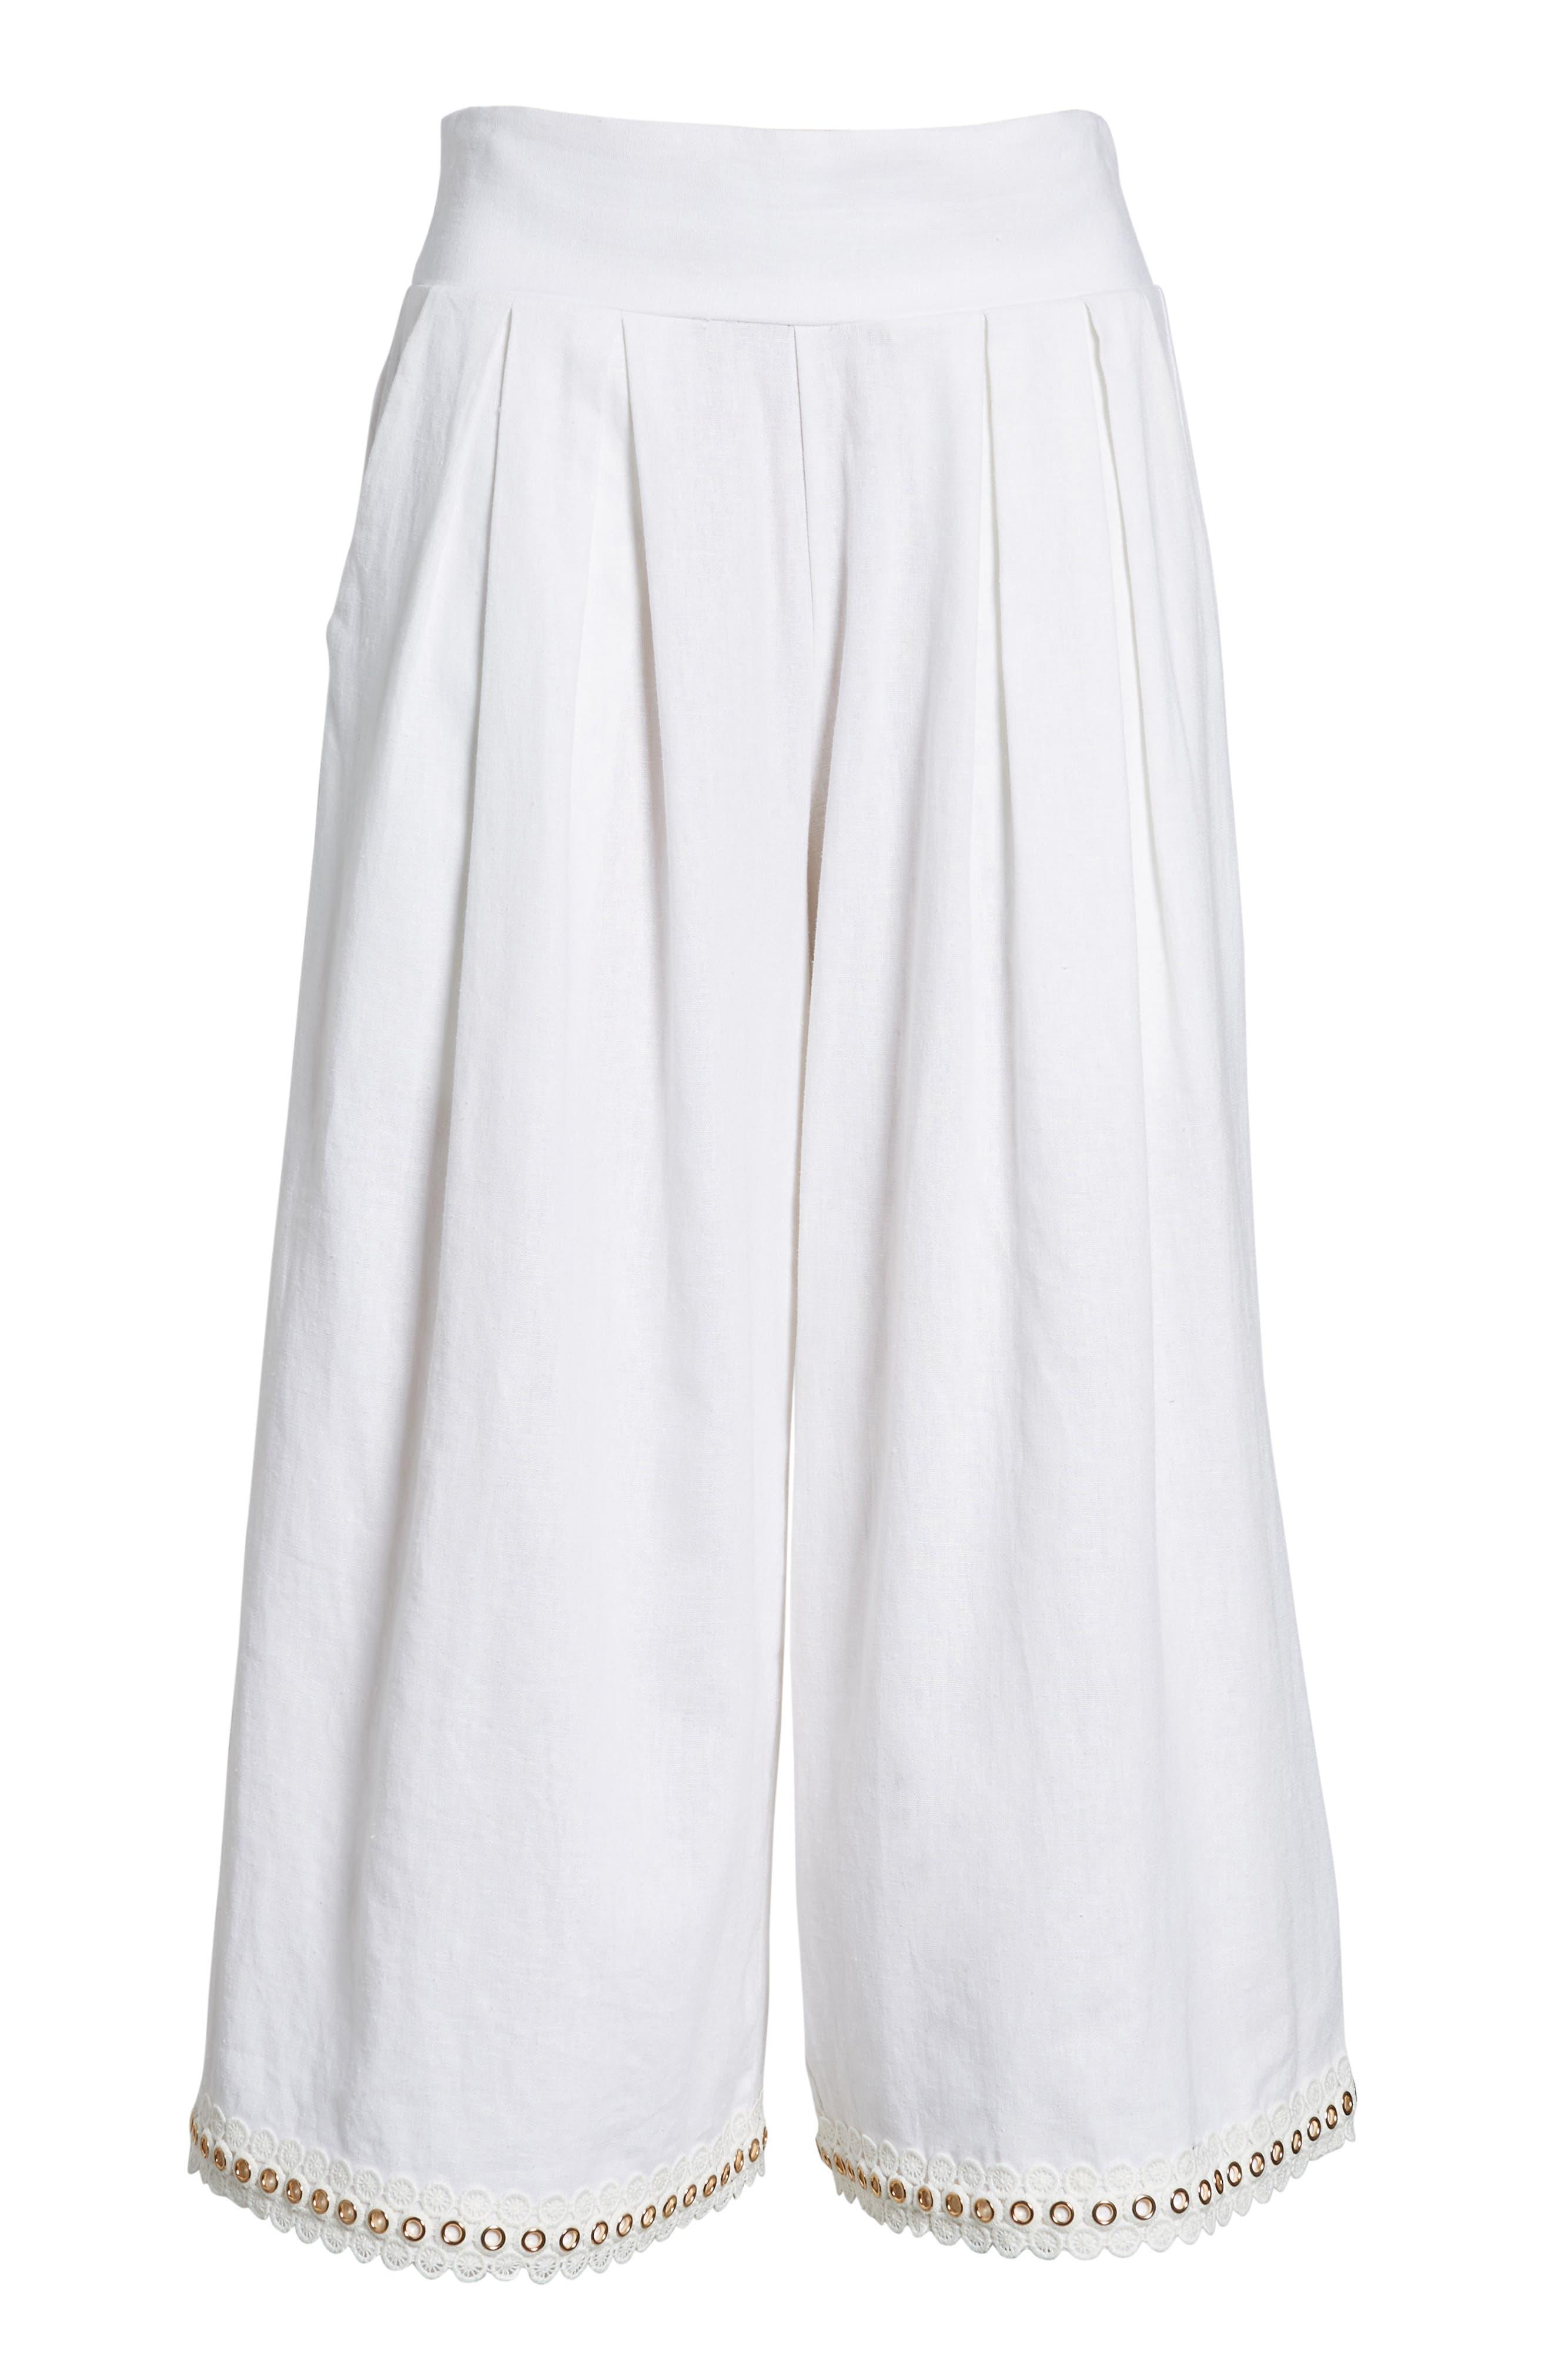 Imara Linen Blend Pants,                             Alternate thumbnail 7, color,                             White